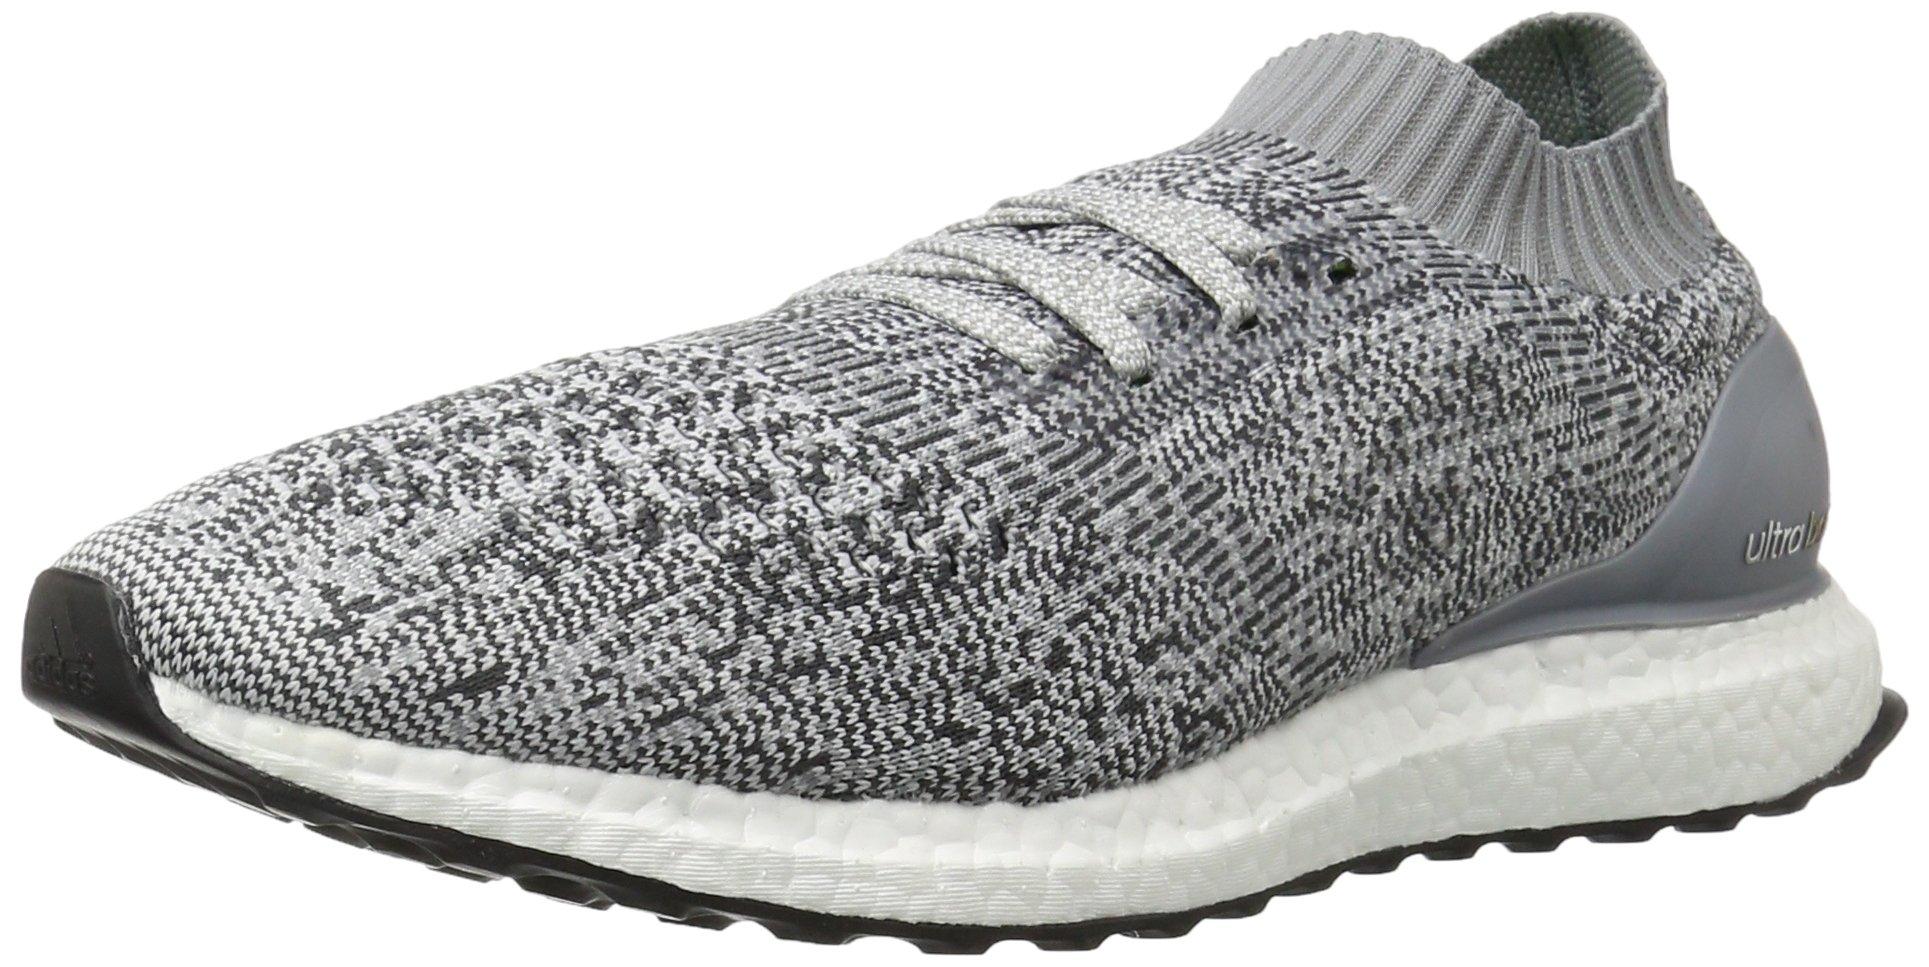 8d26ee232a705 Galleon - Adidas Men s Ultraboost Uncaged M Running Shoe